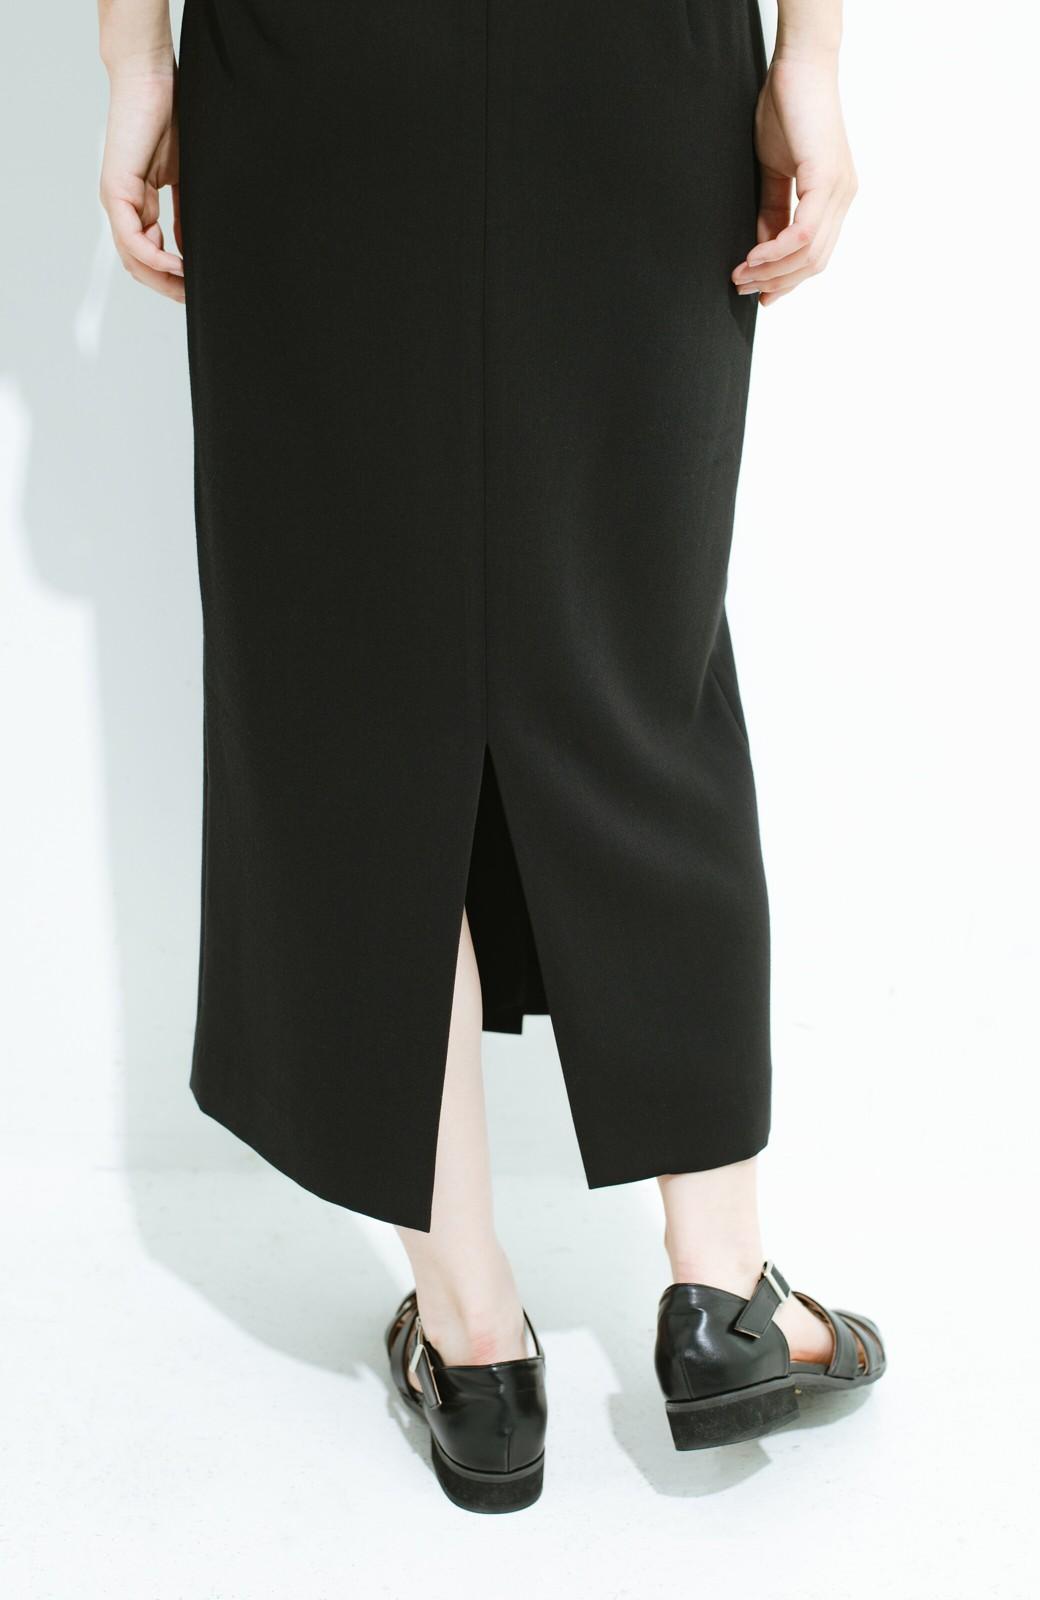 haco! はいてこそ見える実力、セミフォーマルにも使えるオトナのタイトスカート by MAKORI <ブラック>の商品写真6